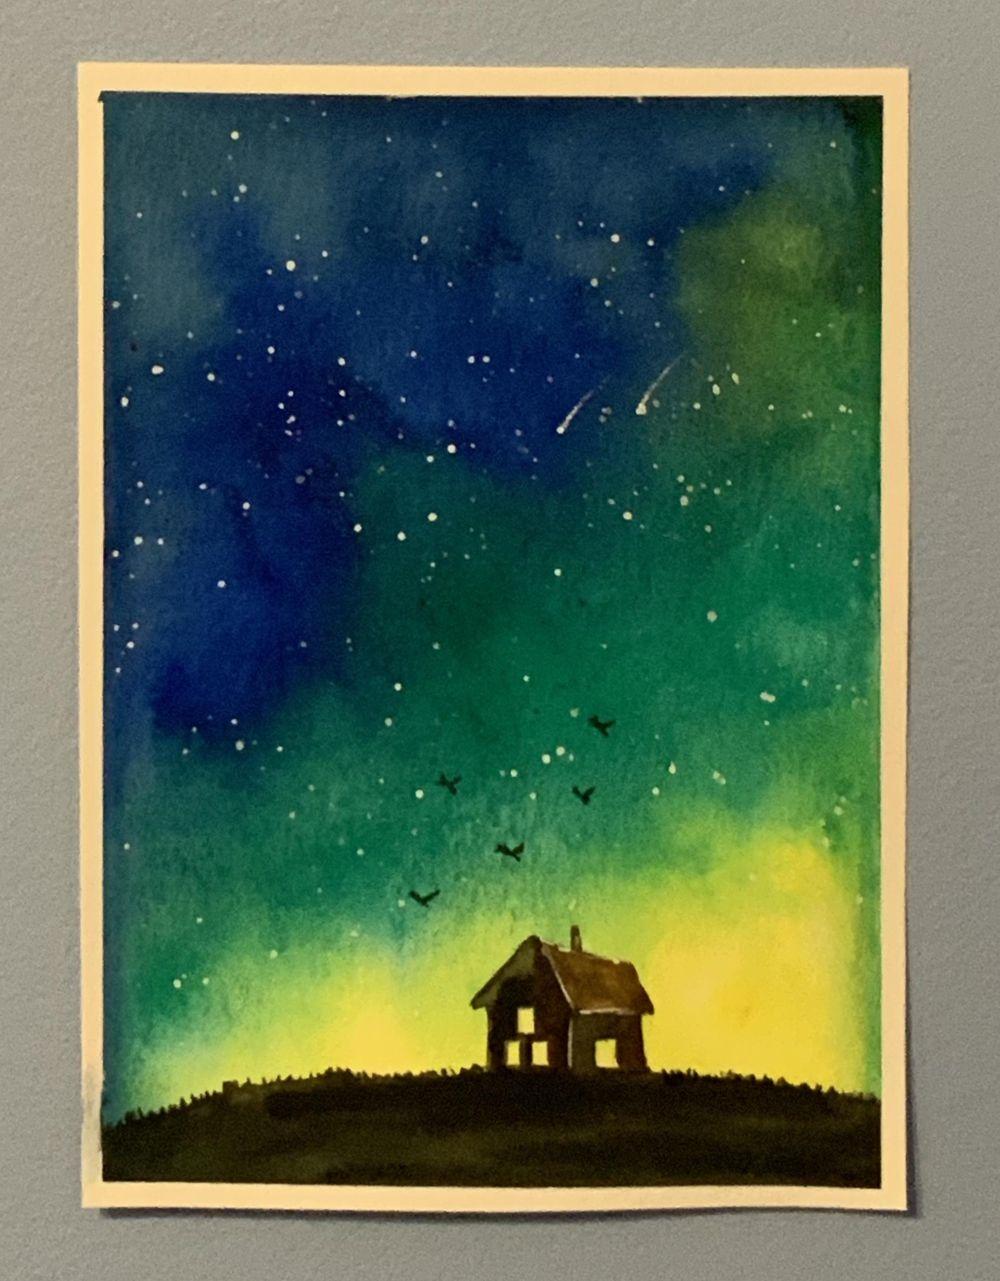 5 beautiful night skies - image 5 - student project